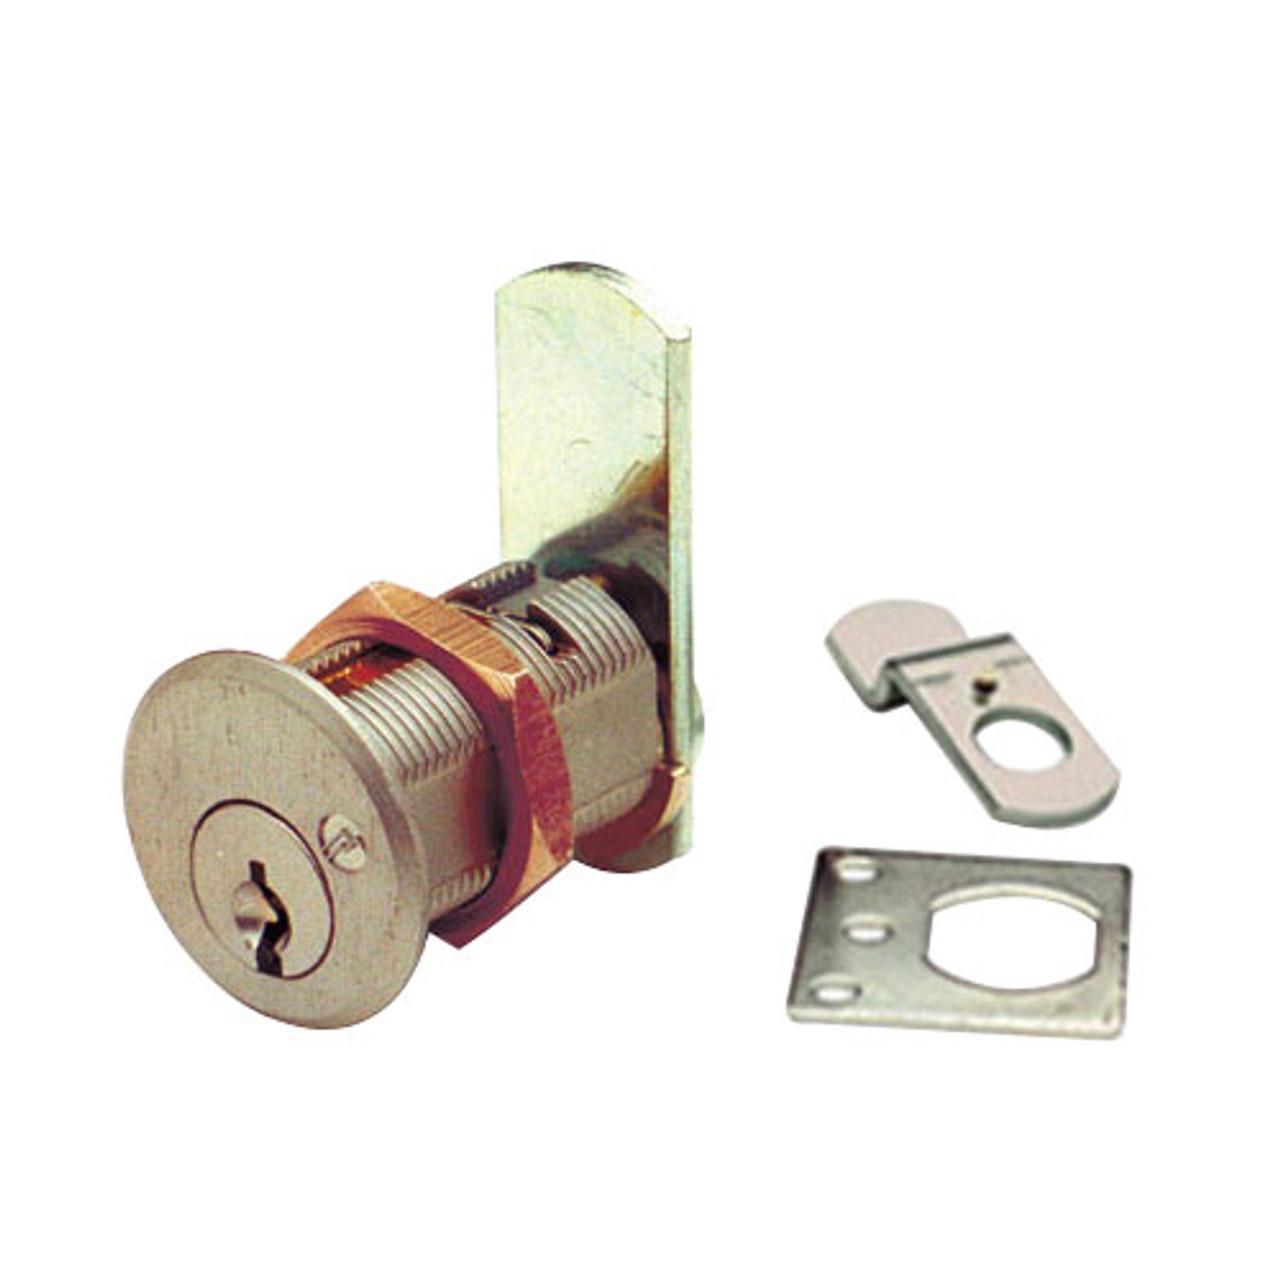 Olympus DCN3-MK-US3 Cam Locks in Bright Brass Finish